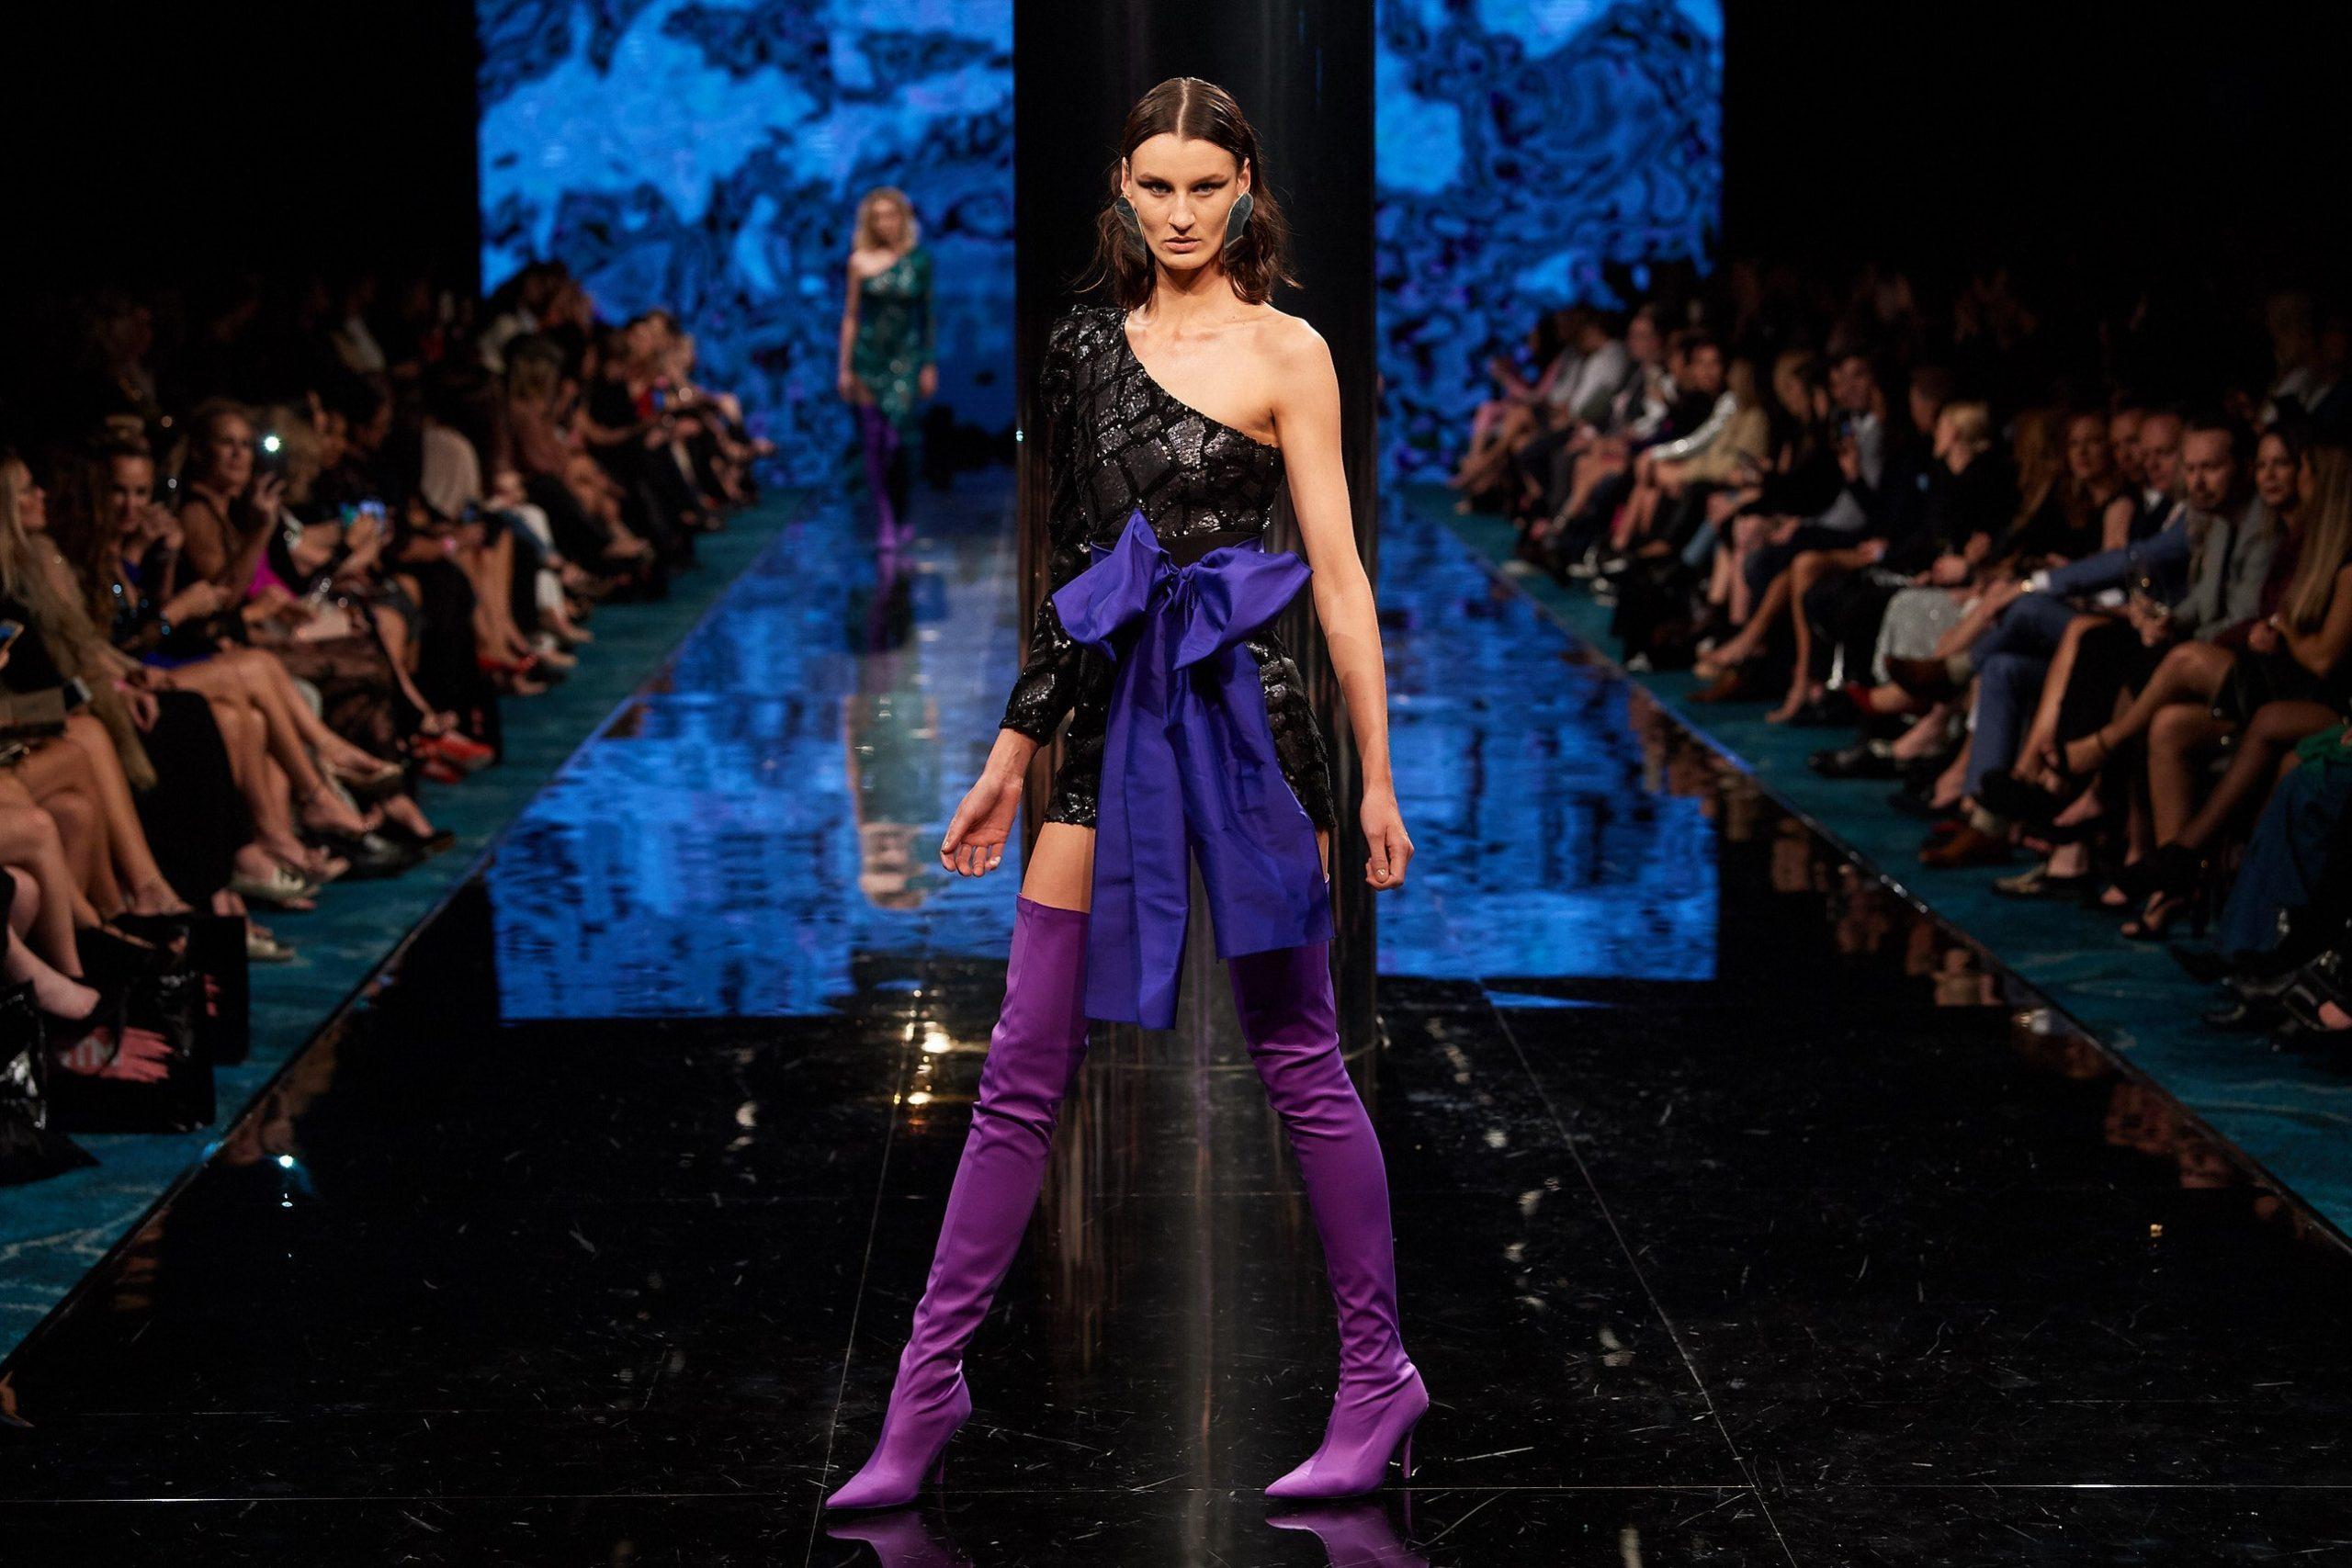 ae'lkemi on the Runway at the Telstra Perth Fashion Festival